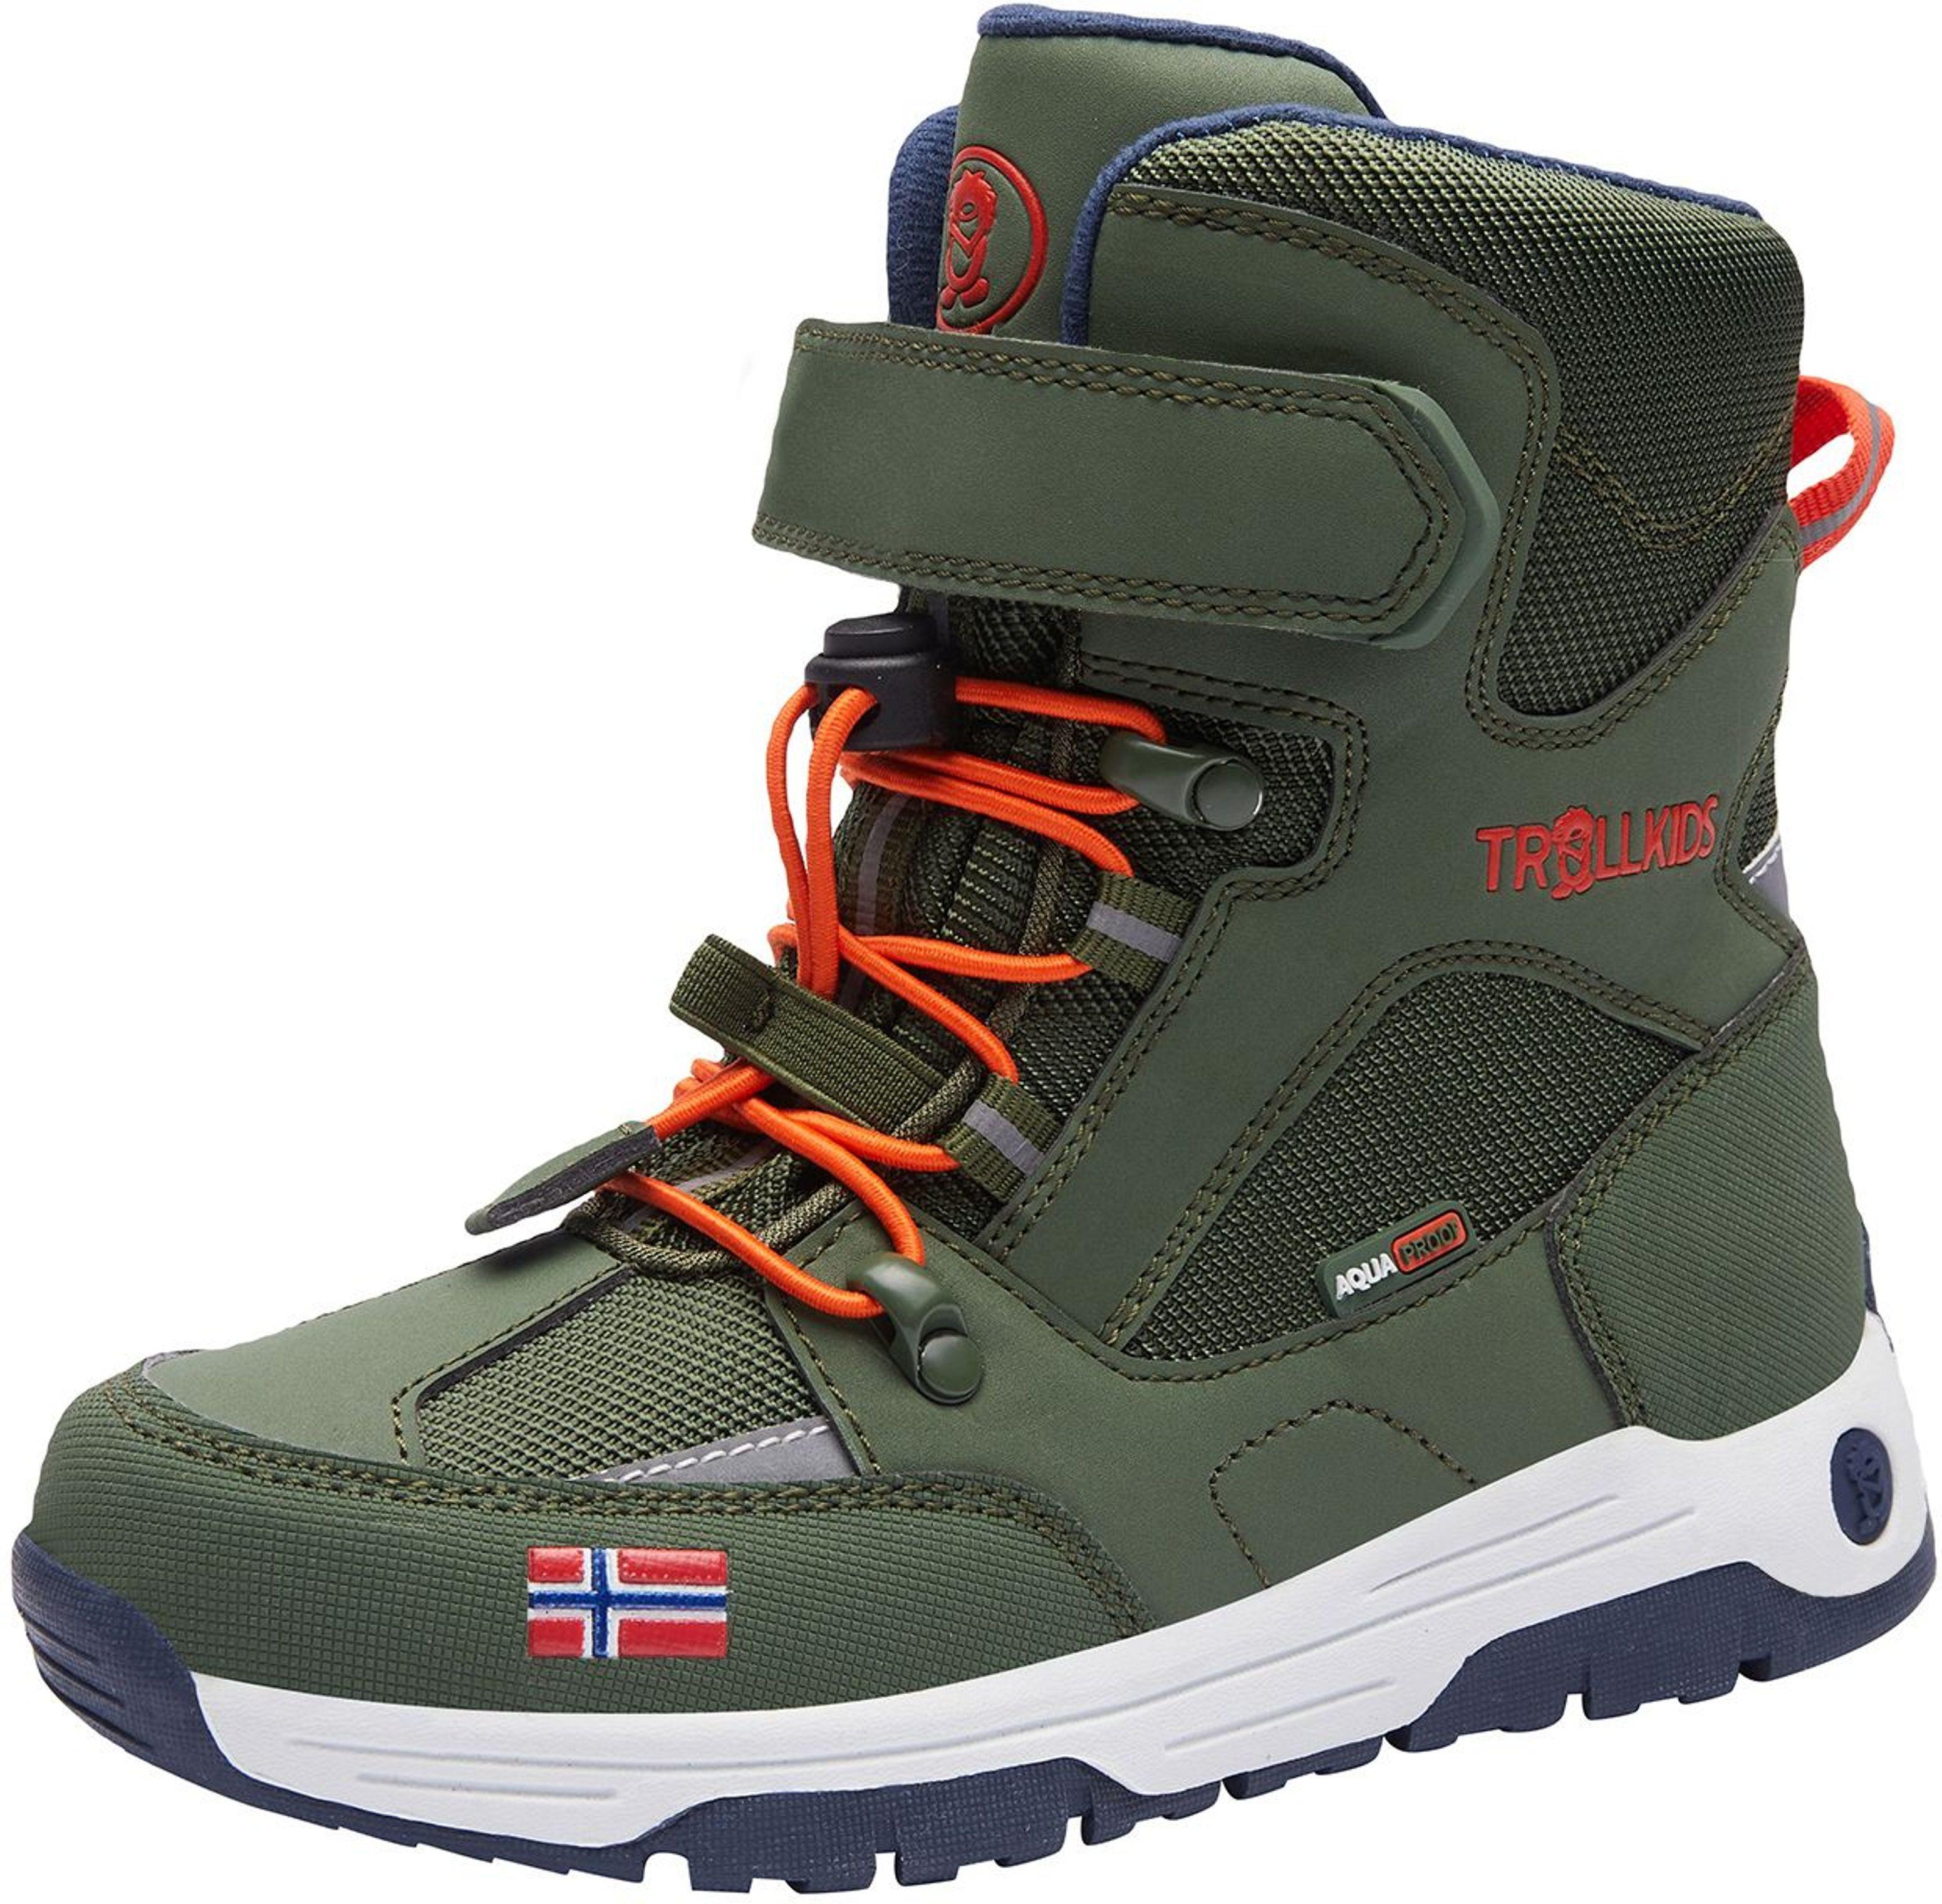 Trollkids Lofoten Winter Boots XT Forest Green/Flame Orange